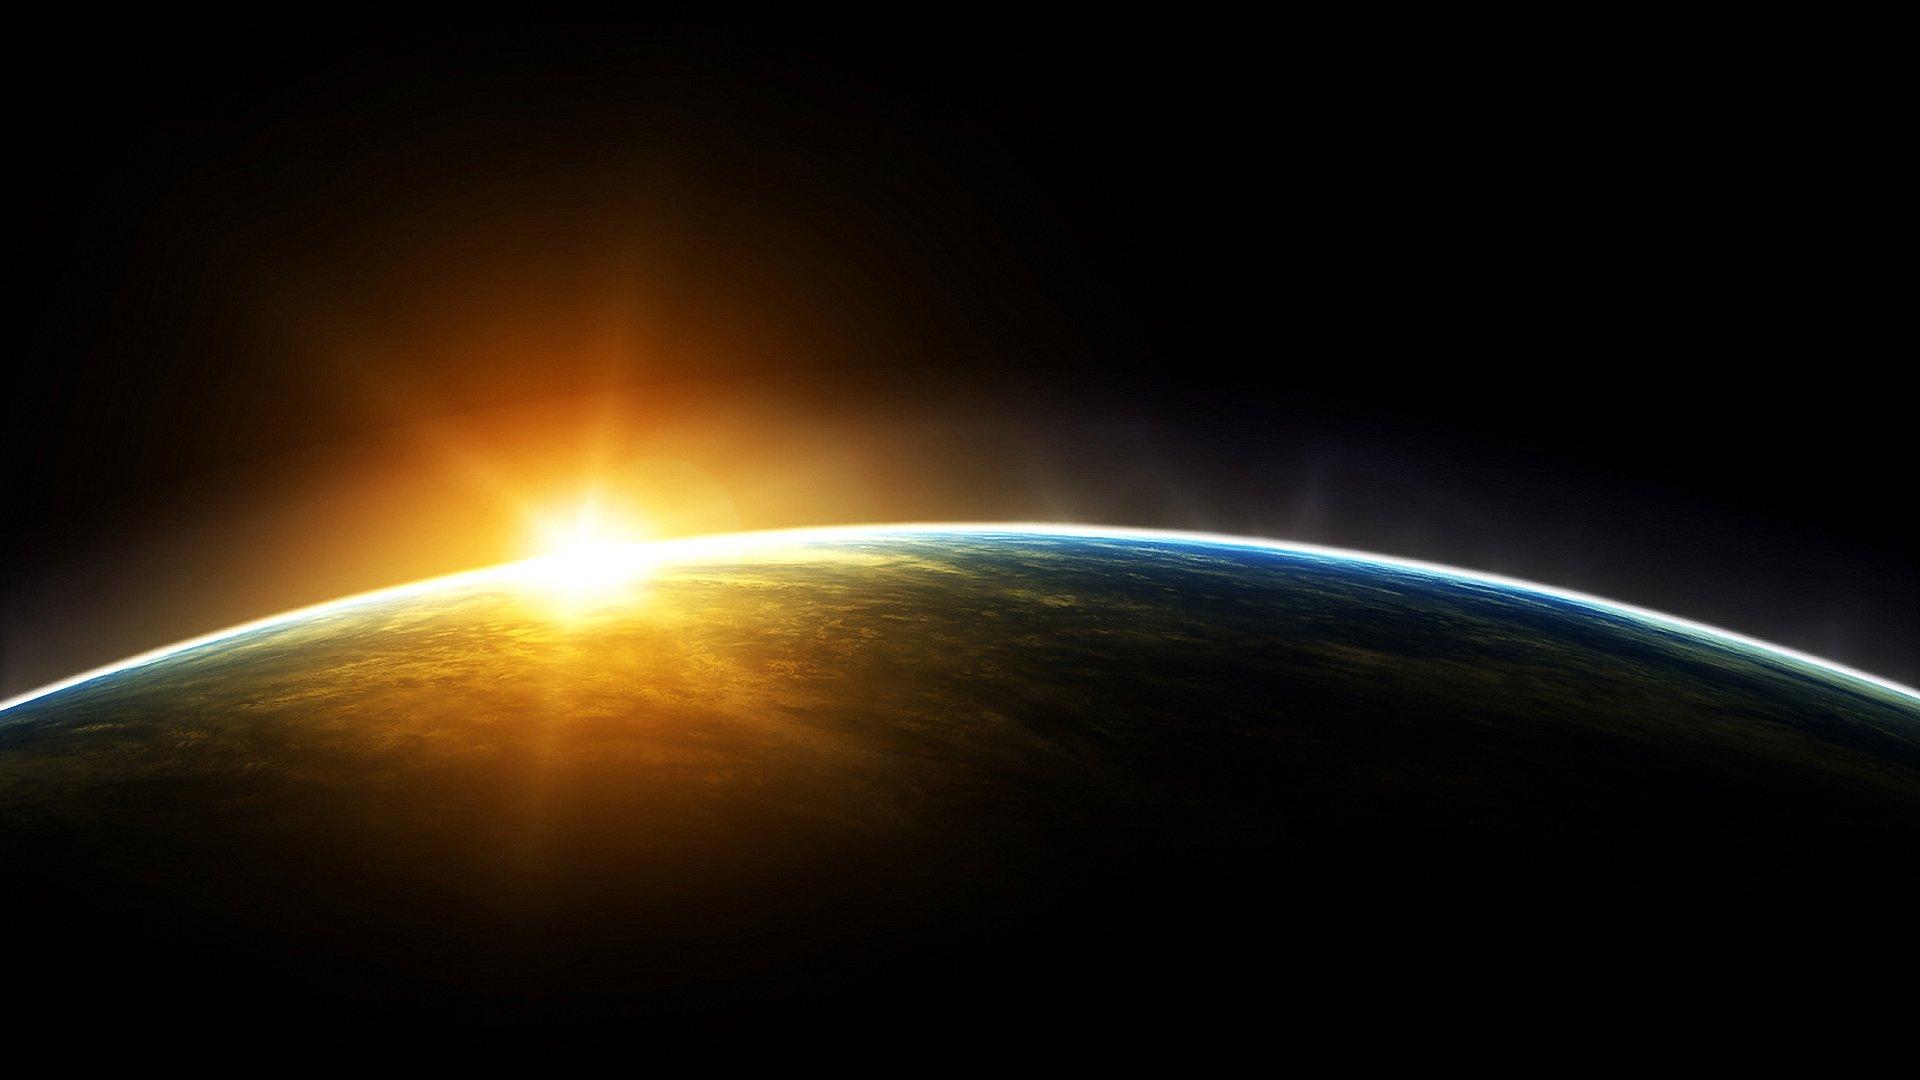 earth planet hd - photo #44